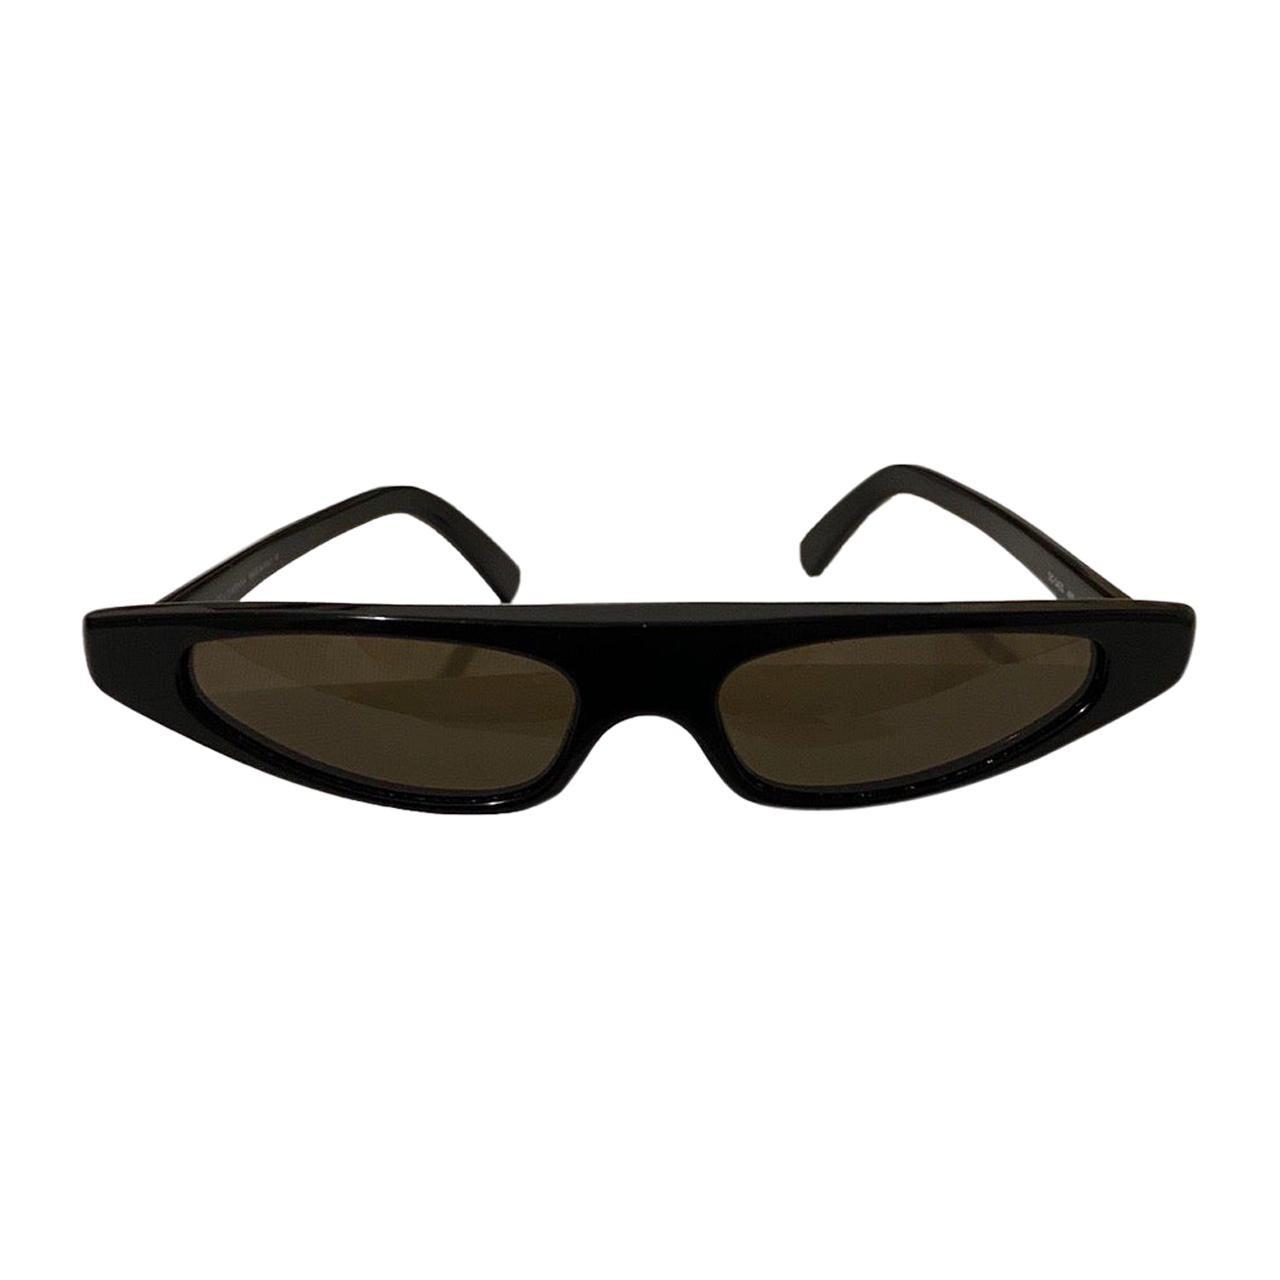 Dolce & Gabbana S/S 2001 Runway Cat-Eye Sunglasses